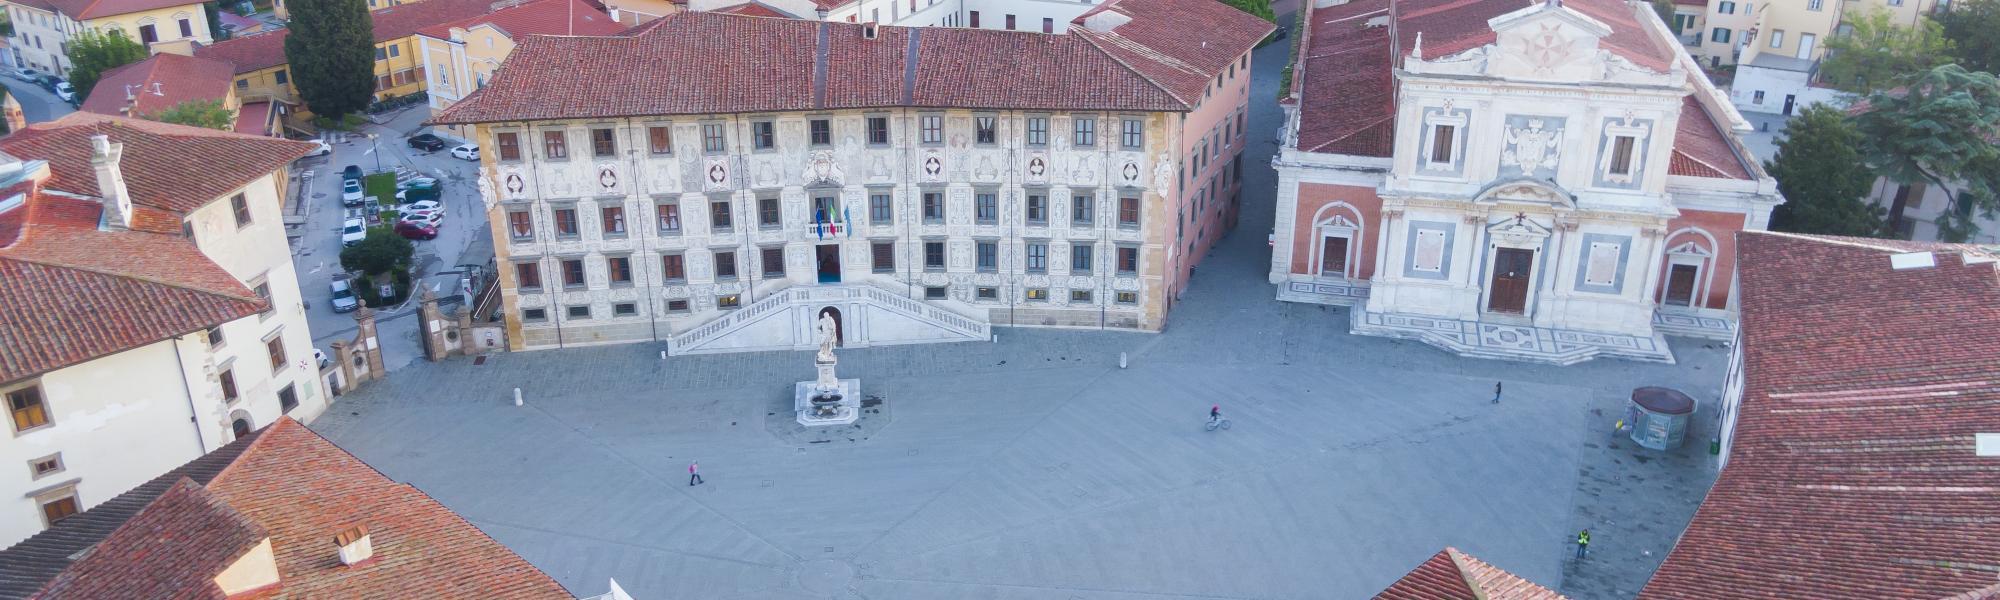 Veduta aerea Piazza dei Cavalieri